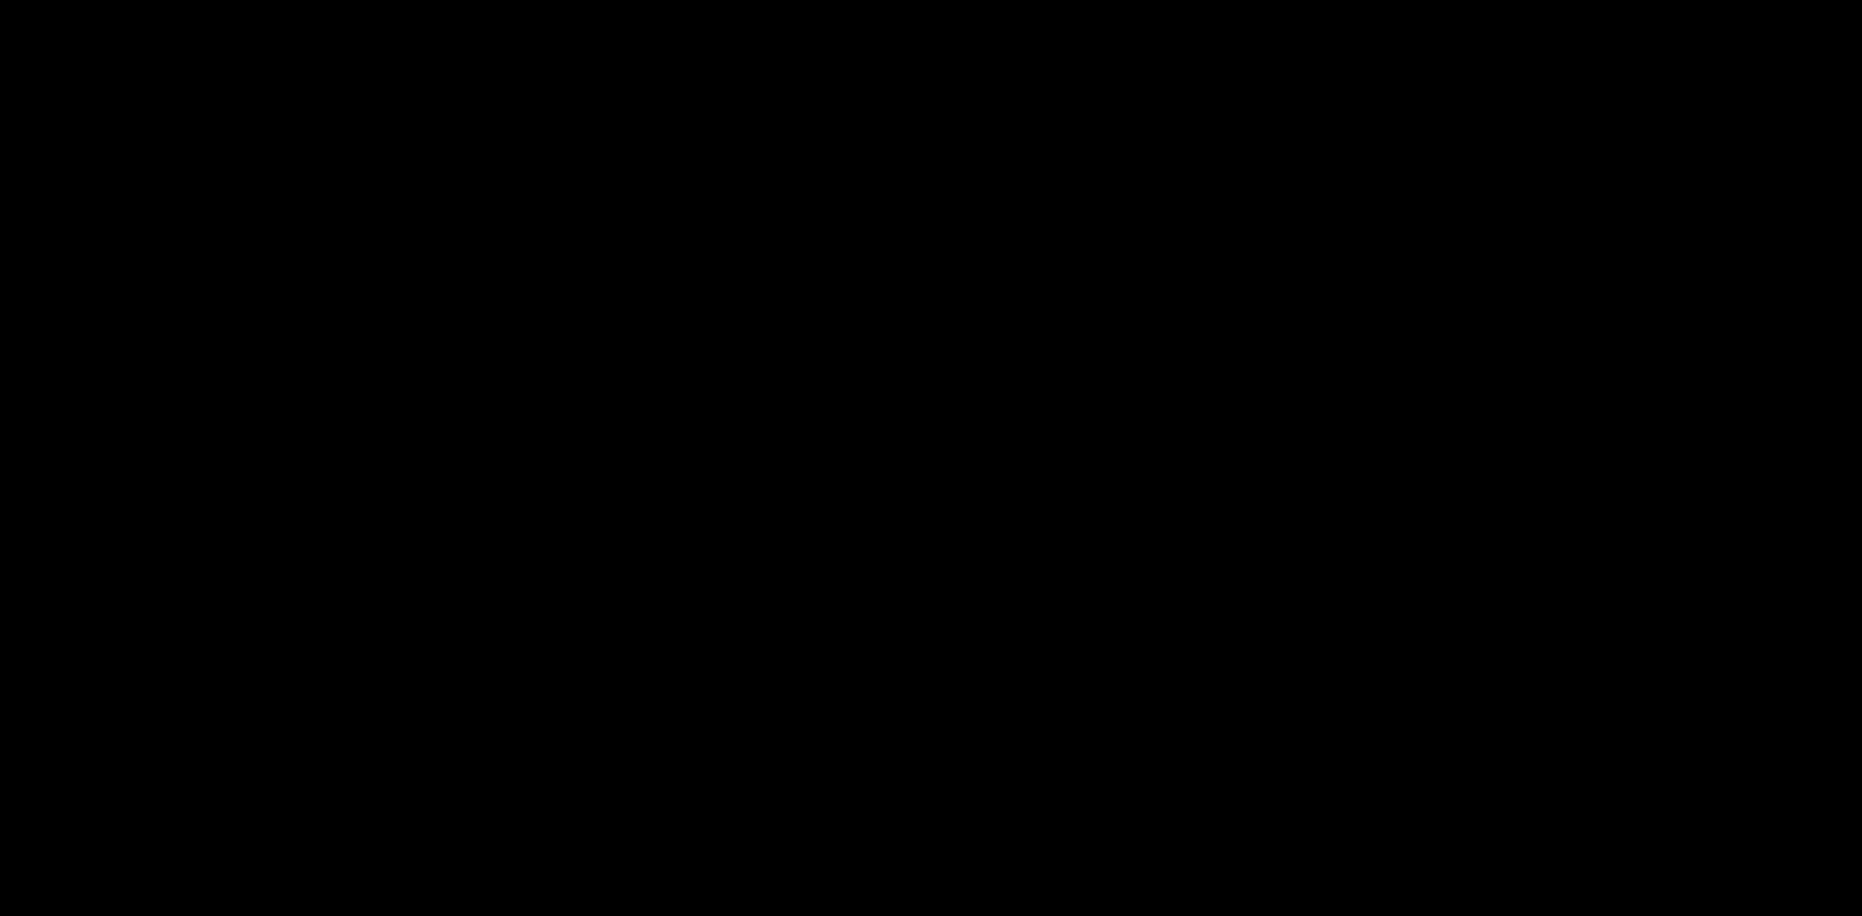 L-Valacyclovir hydrochloride